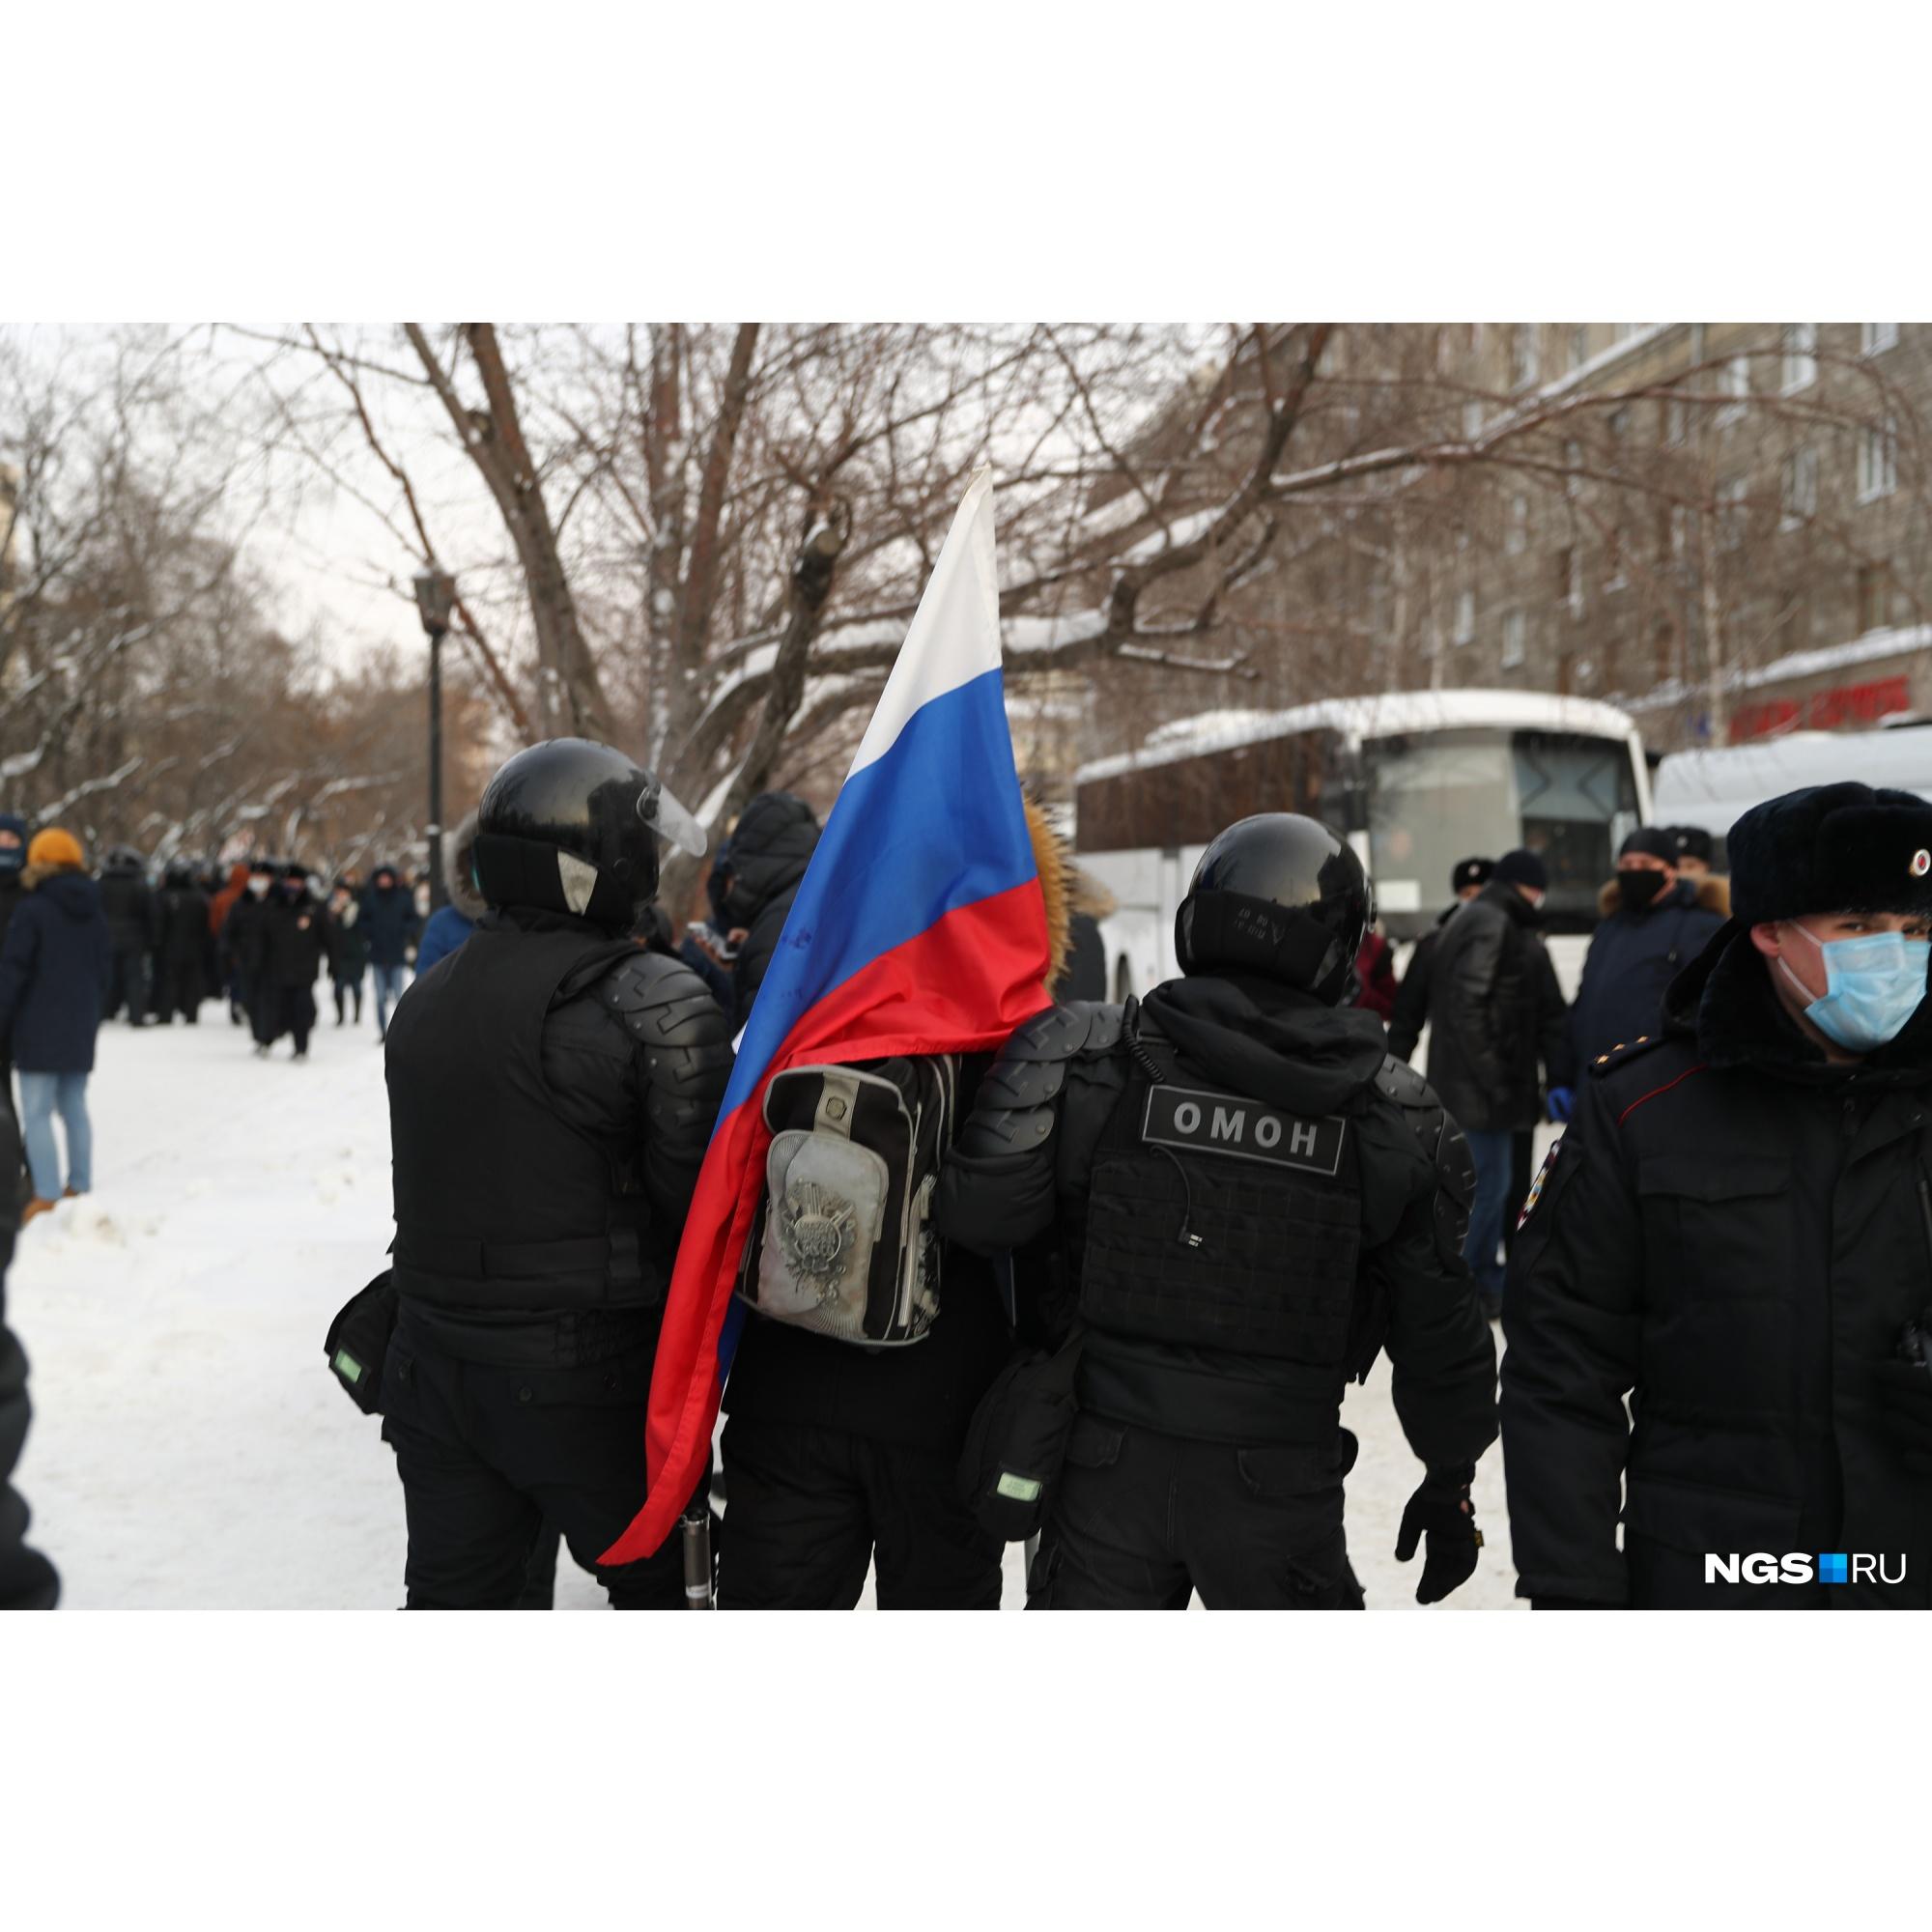 Сотрудники ОМОНа уводят участника акции с российским флагом